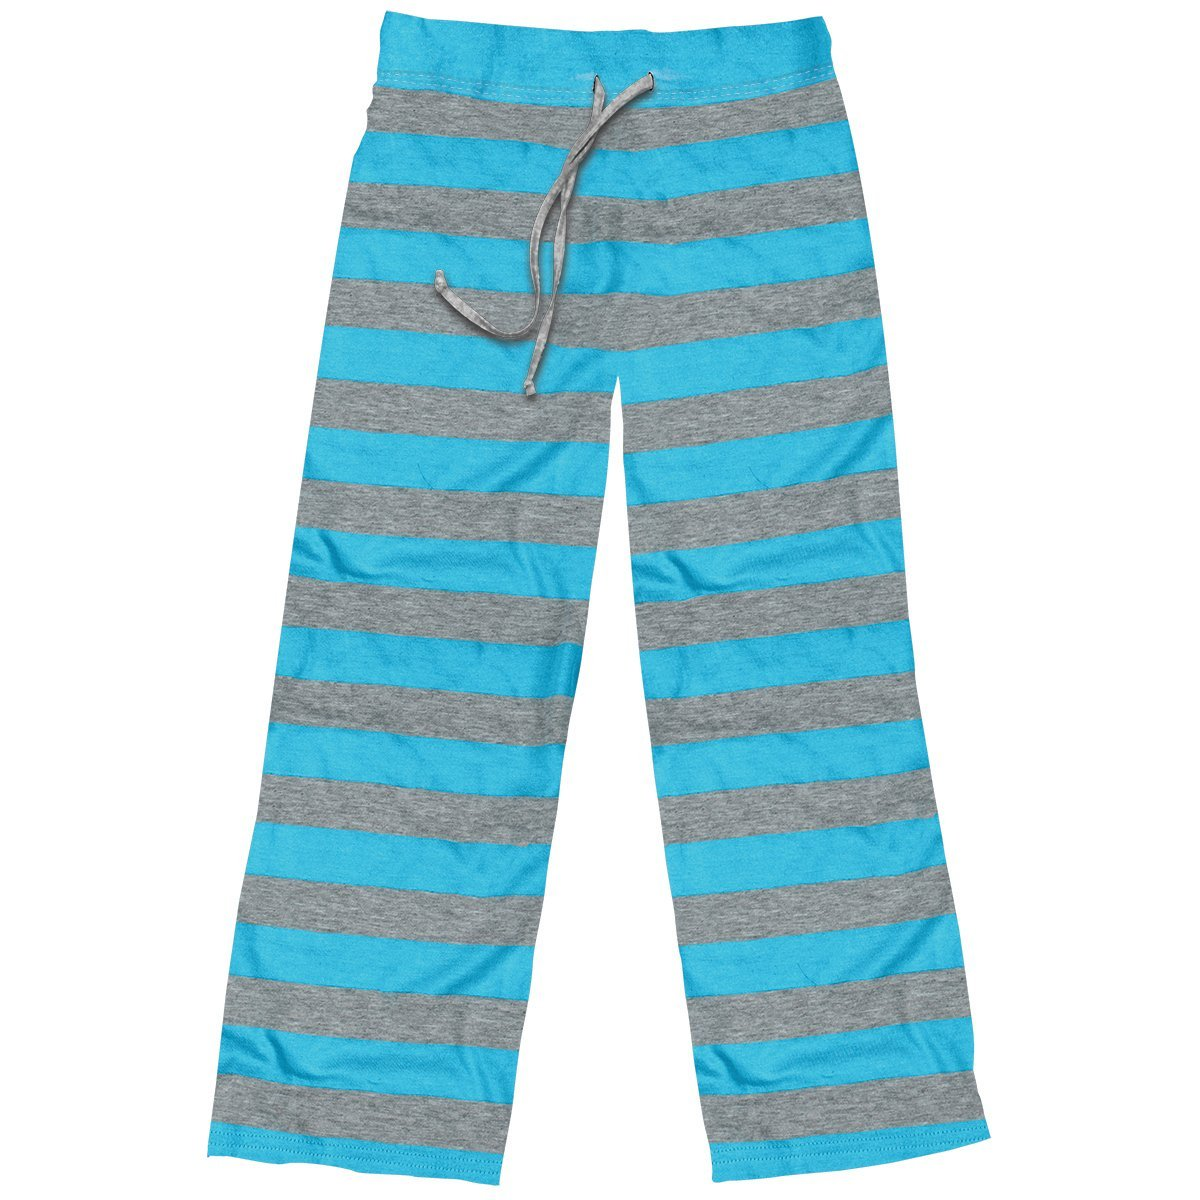 7-14 Girls Super Cozy Fleece Pajama Bottom Lounge Pants North 15